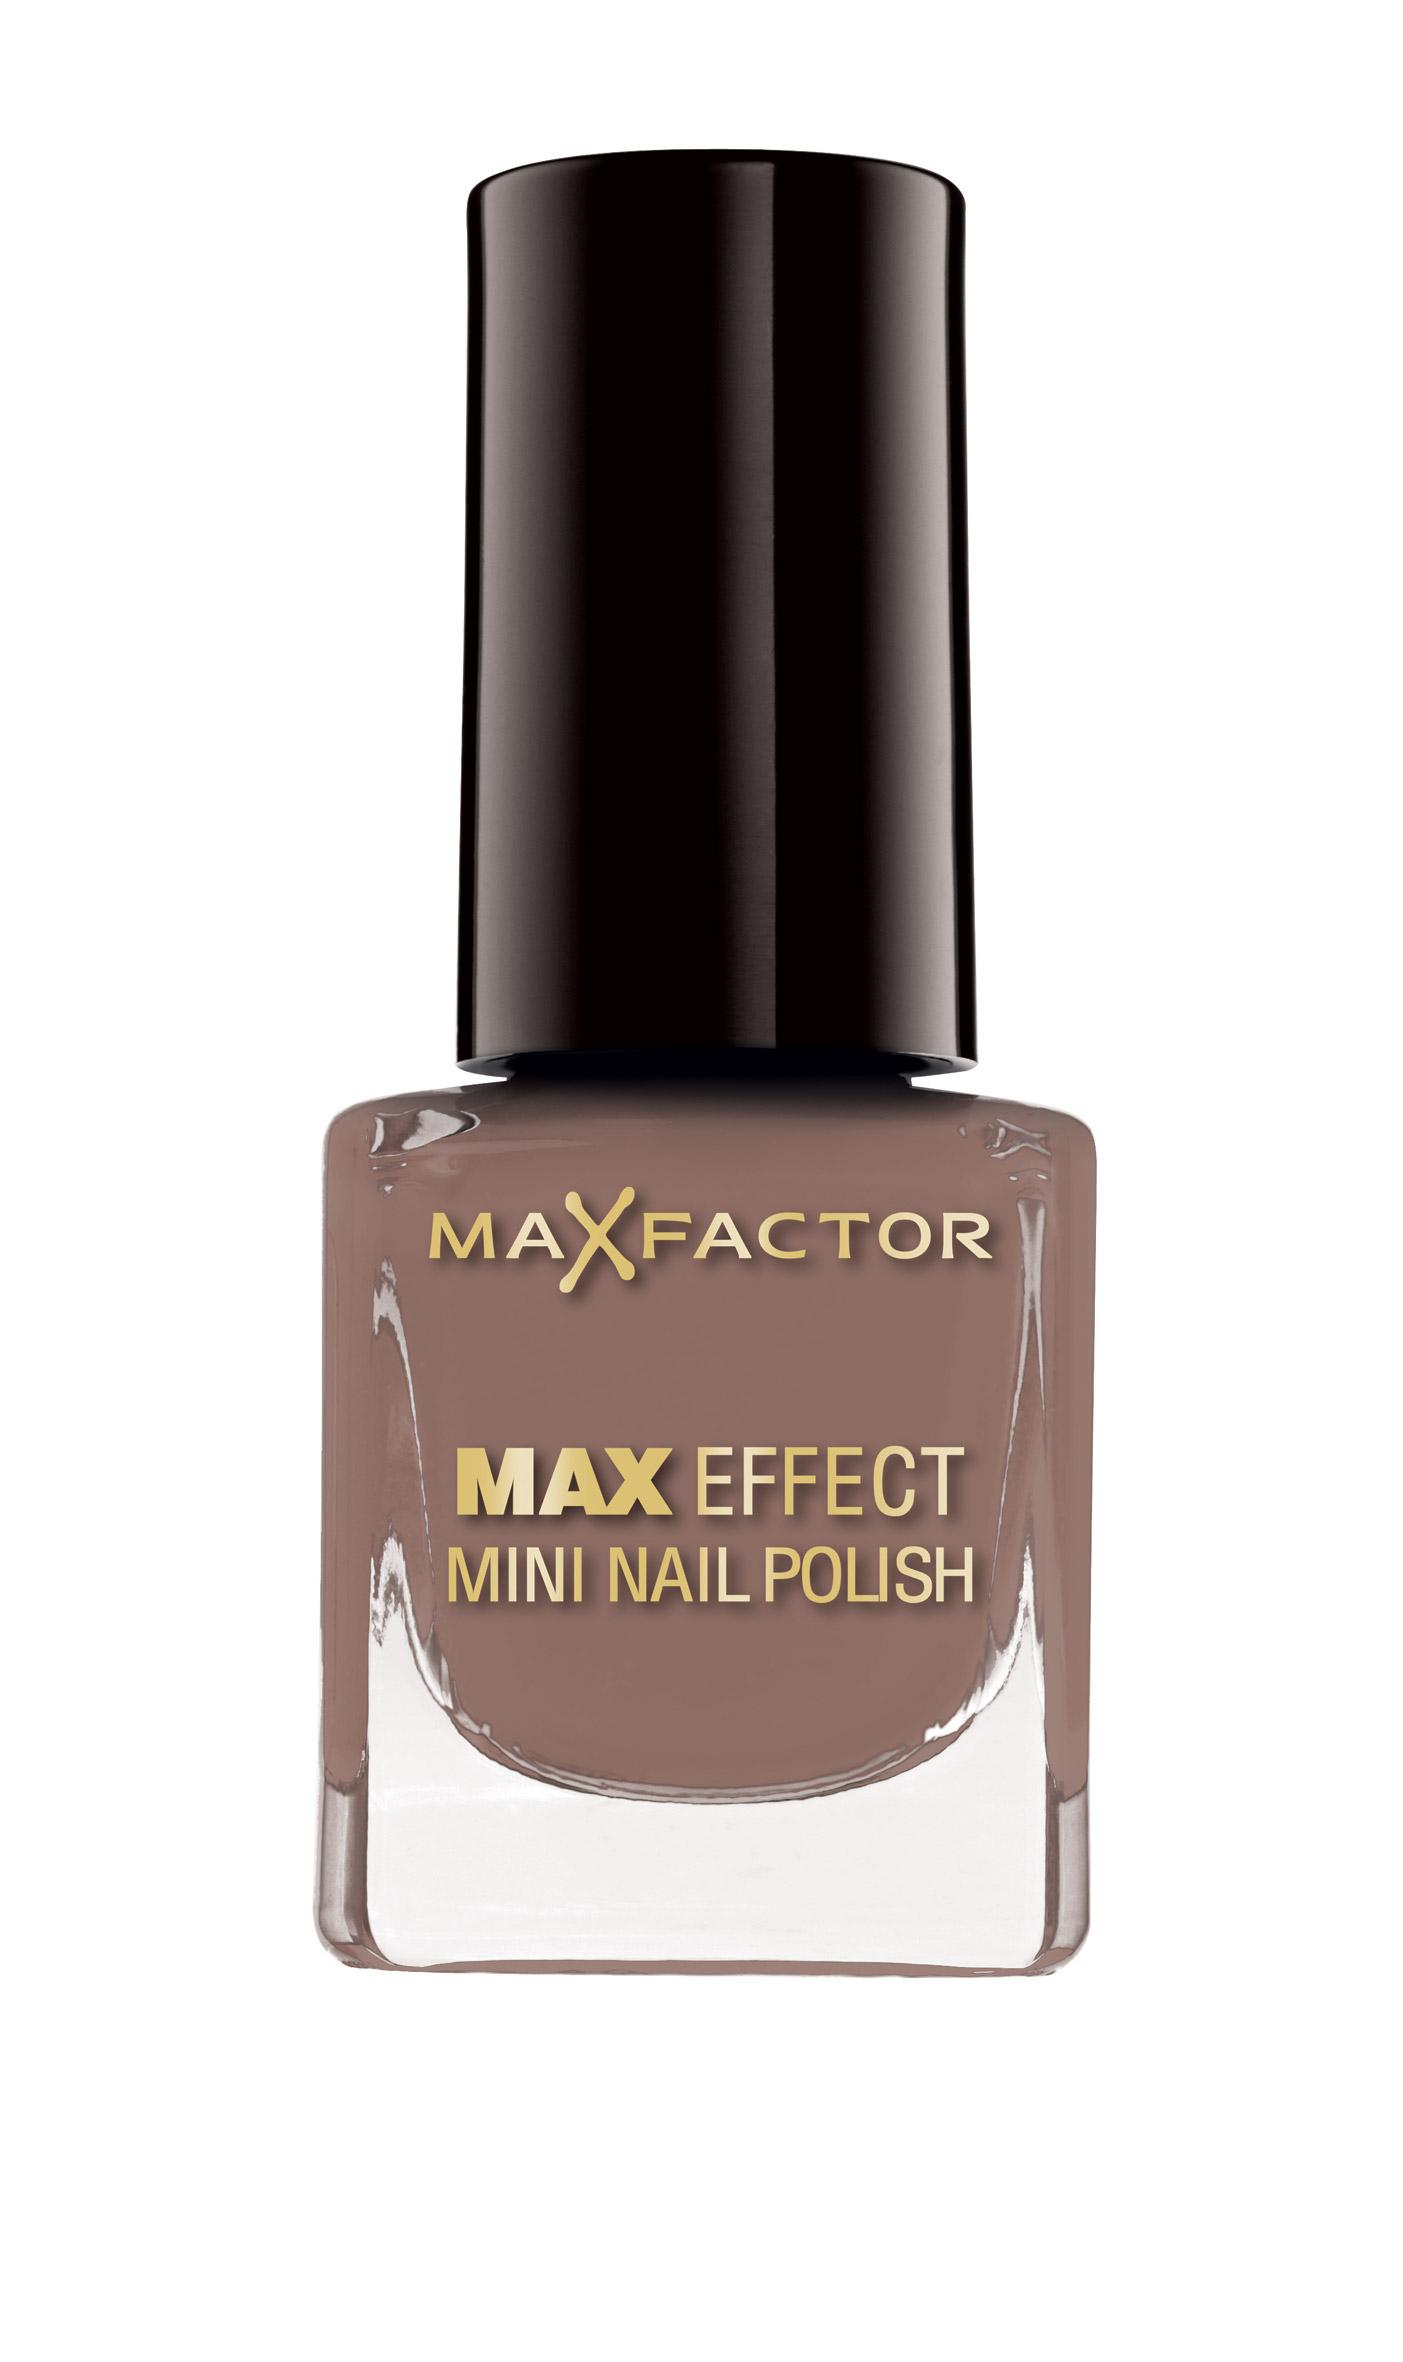 Max Factor Max Effect Mini Nail Polish_165 Hot Coco